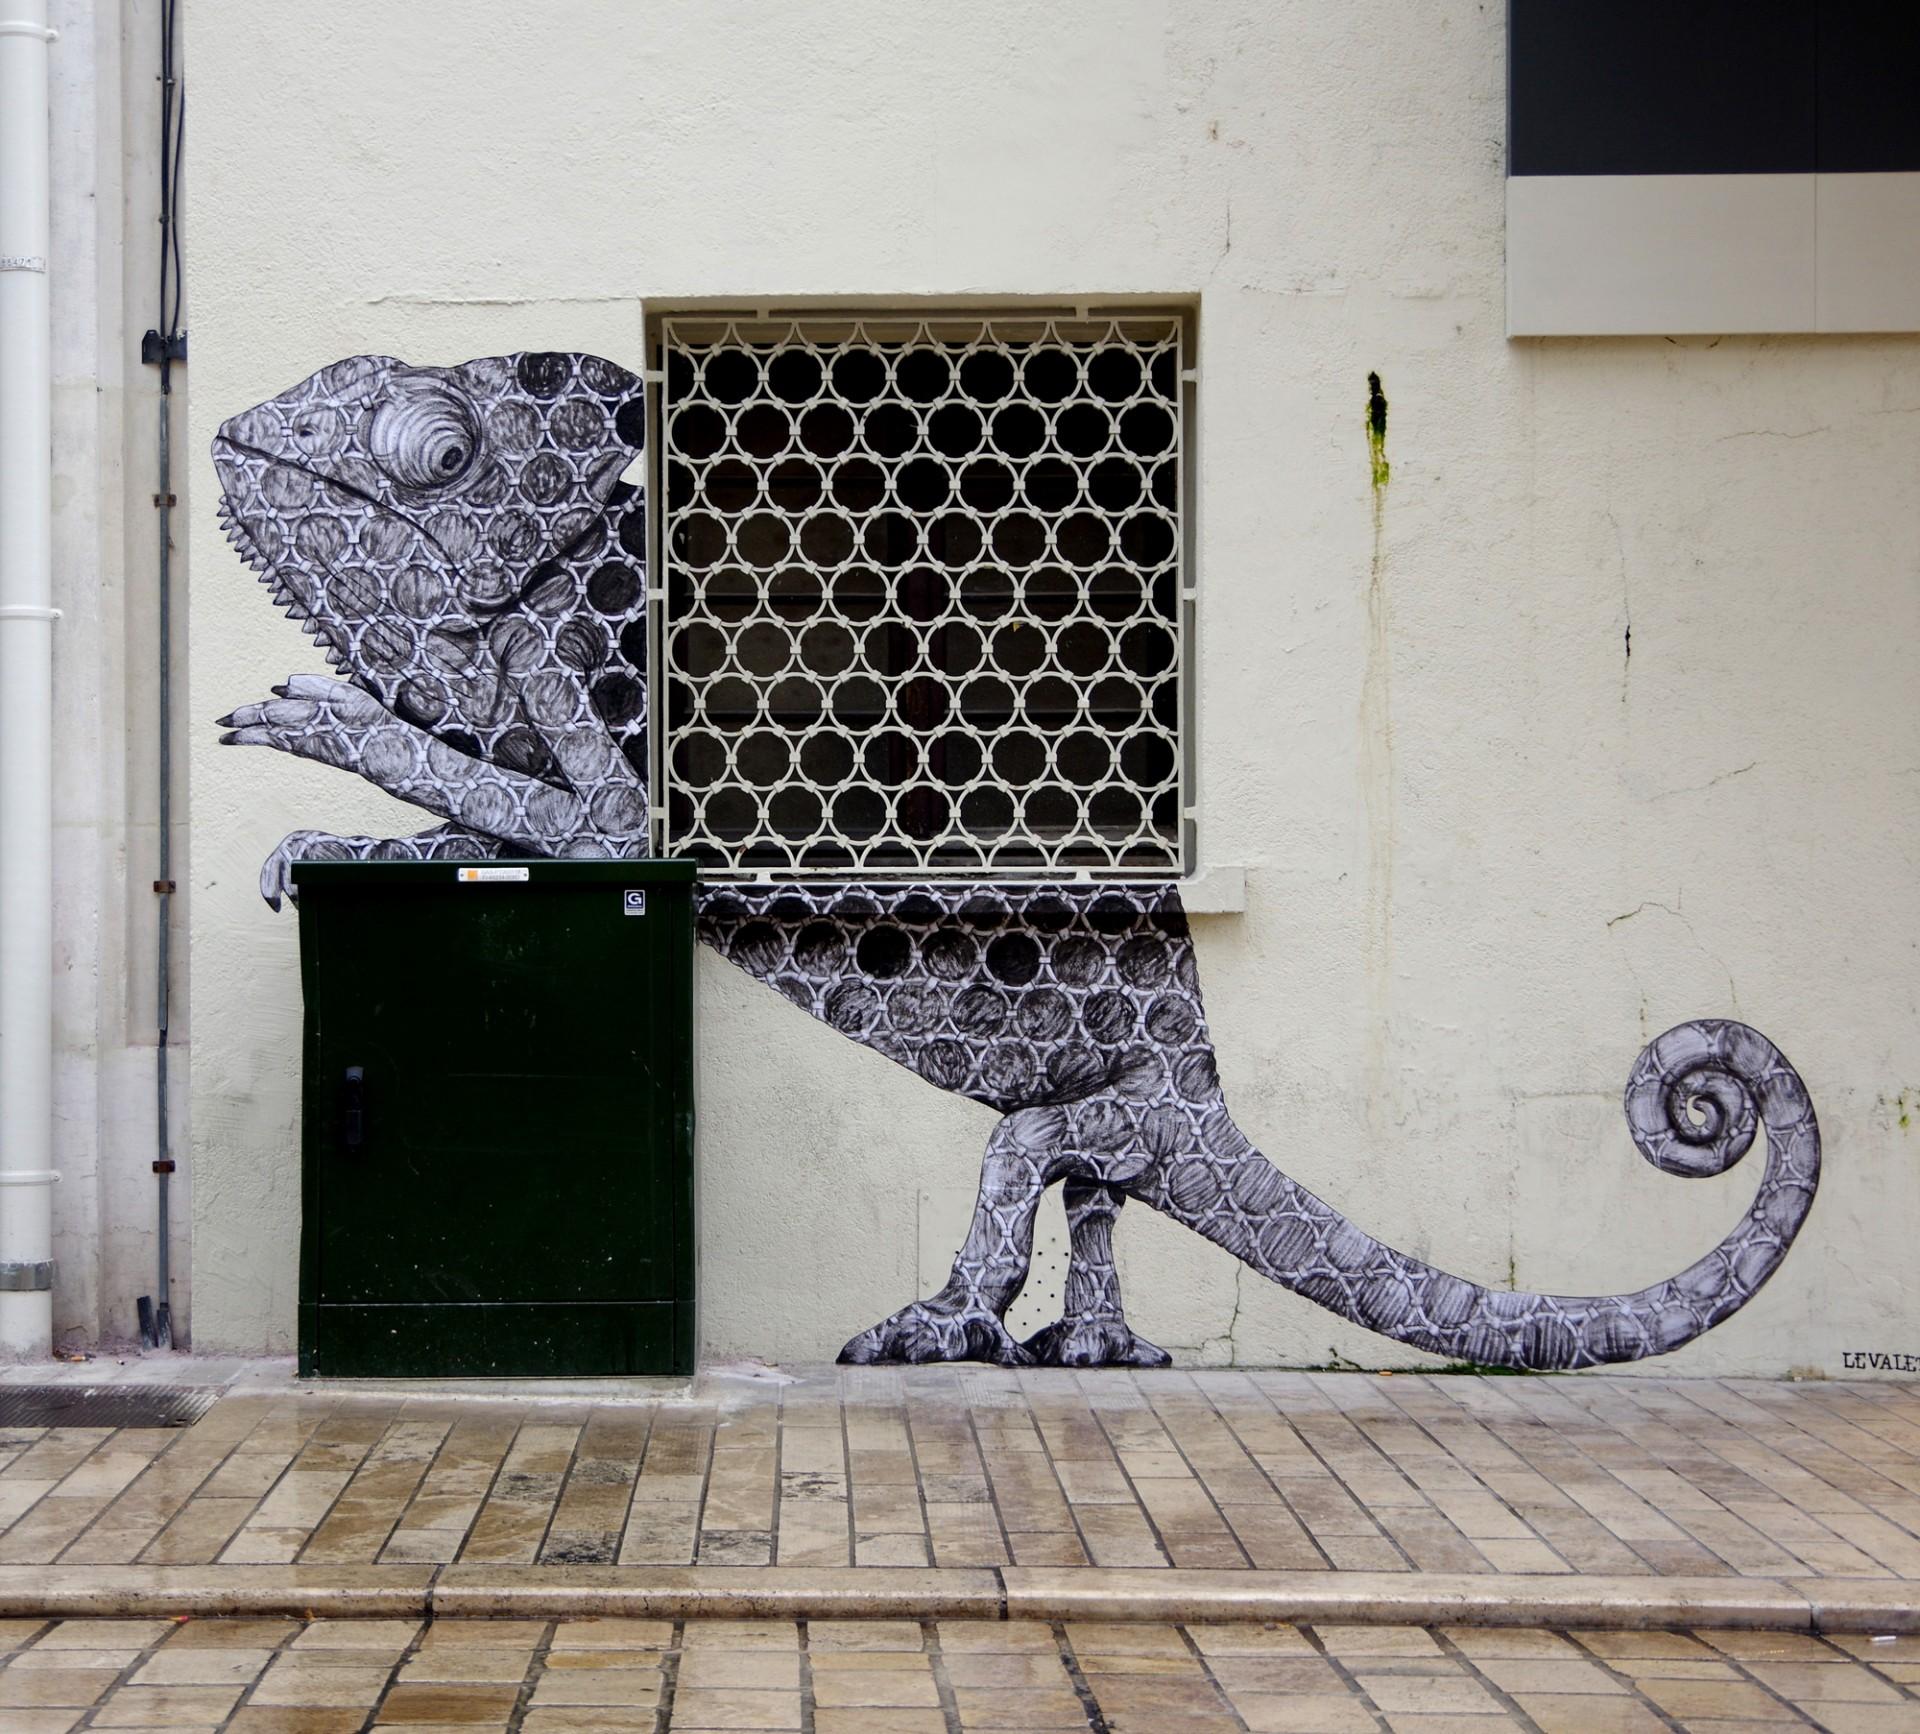 Camaleão urbano